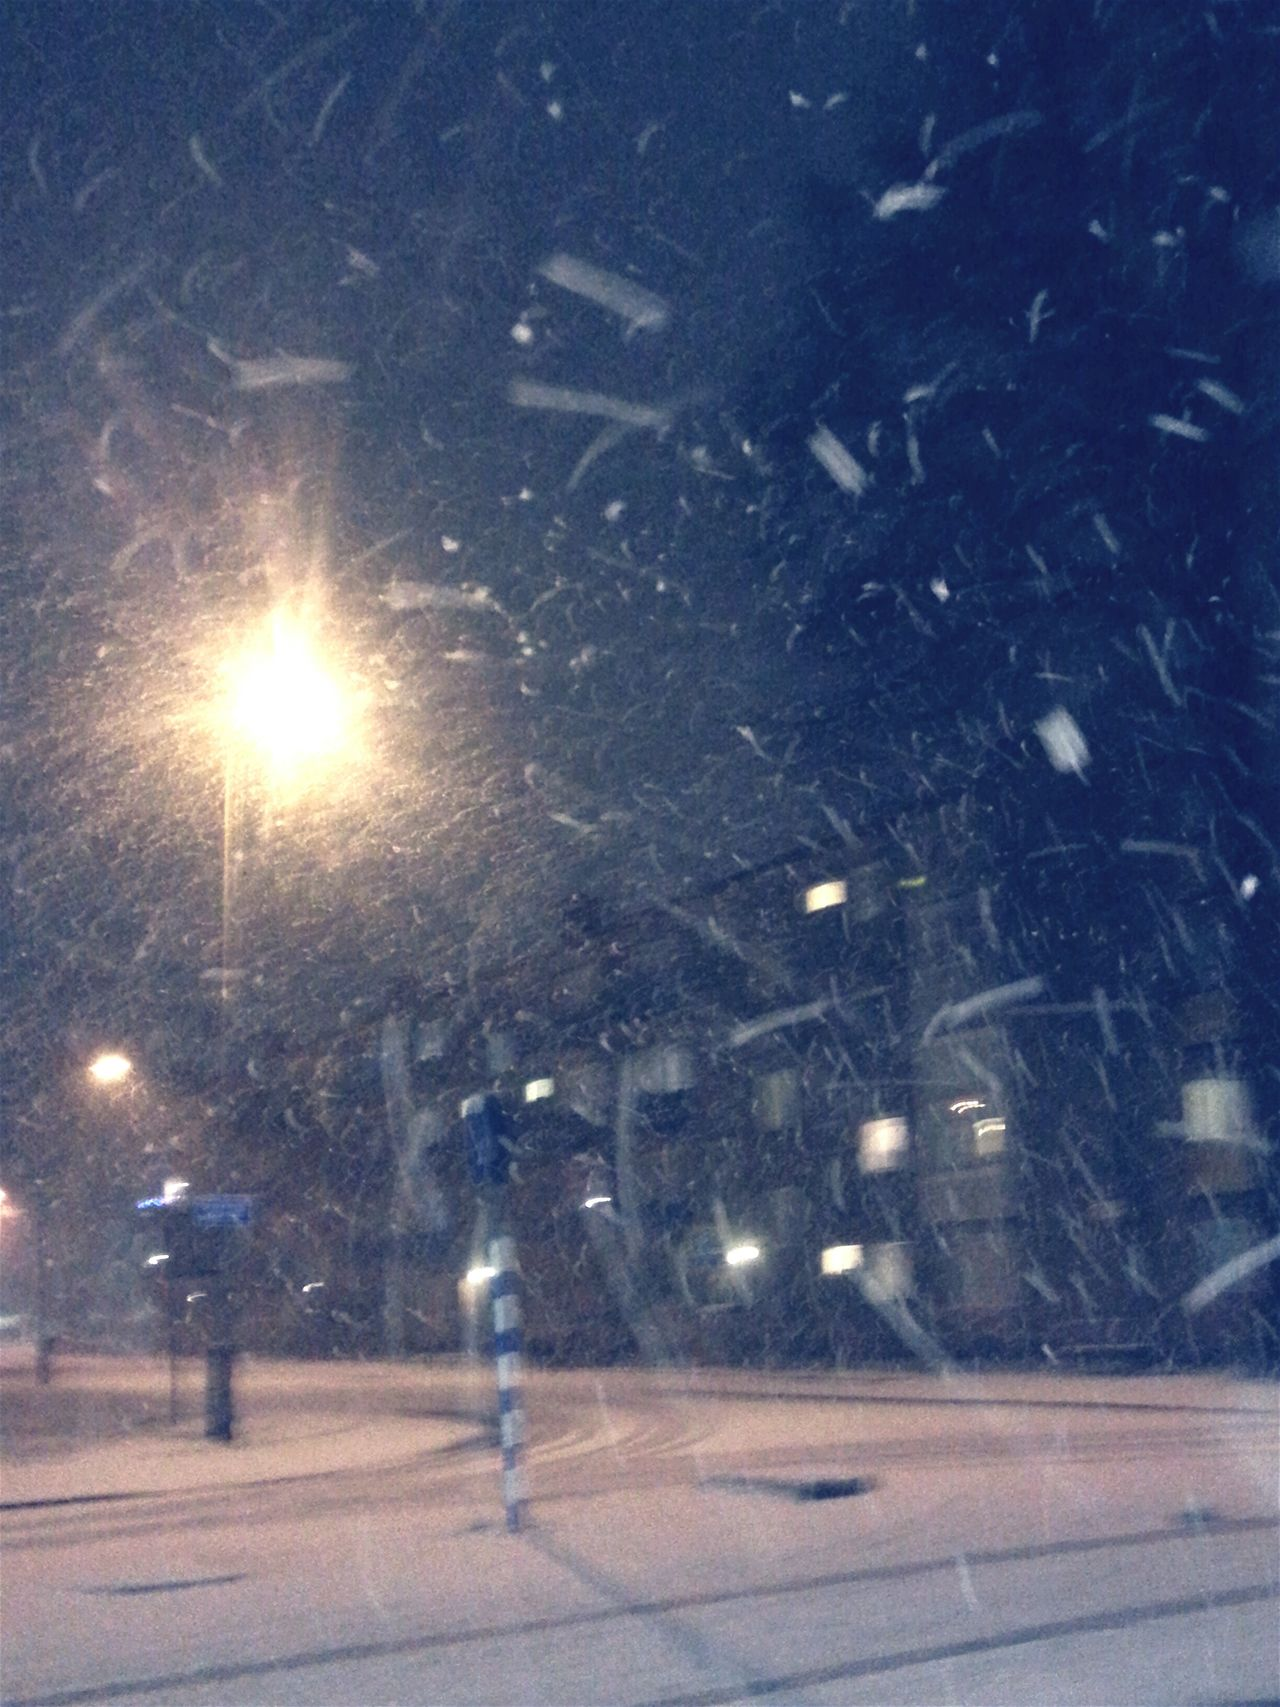 It's Cold Outside Storm Gorm Crossroadlight In Snowy Night